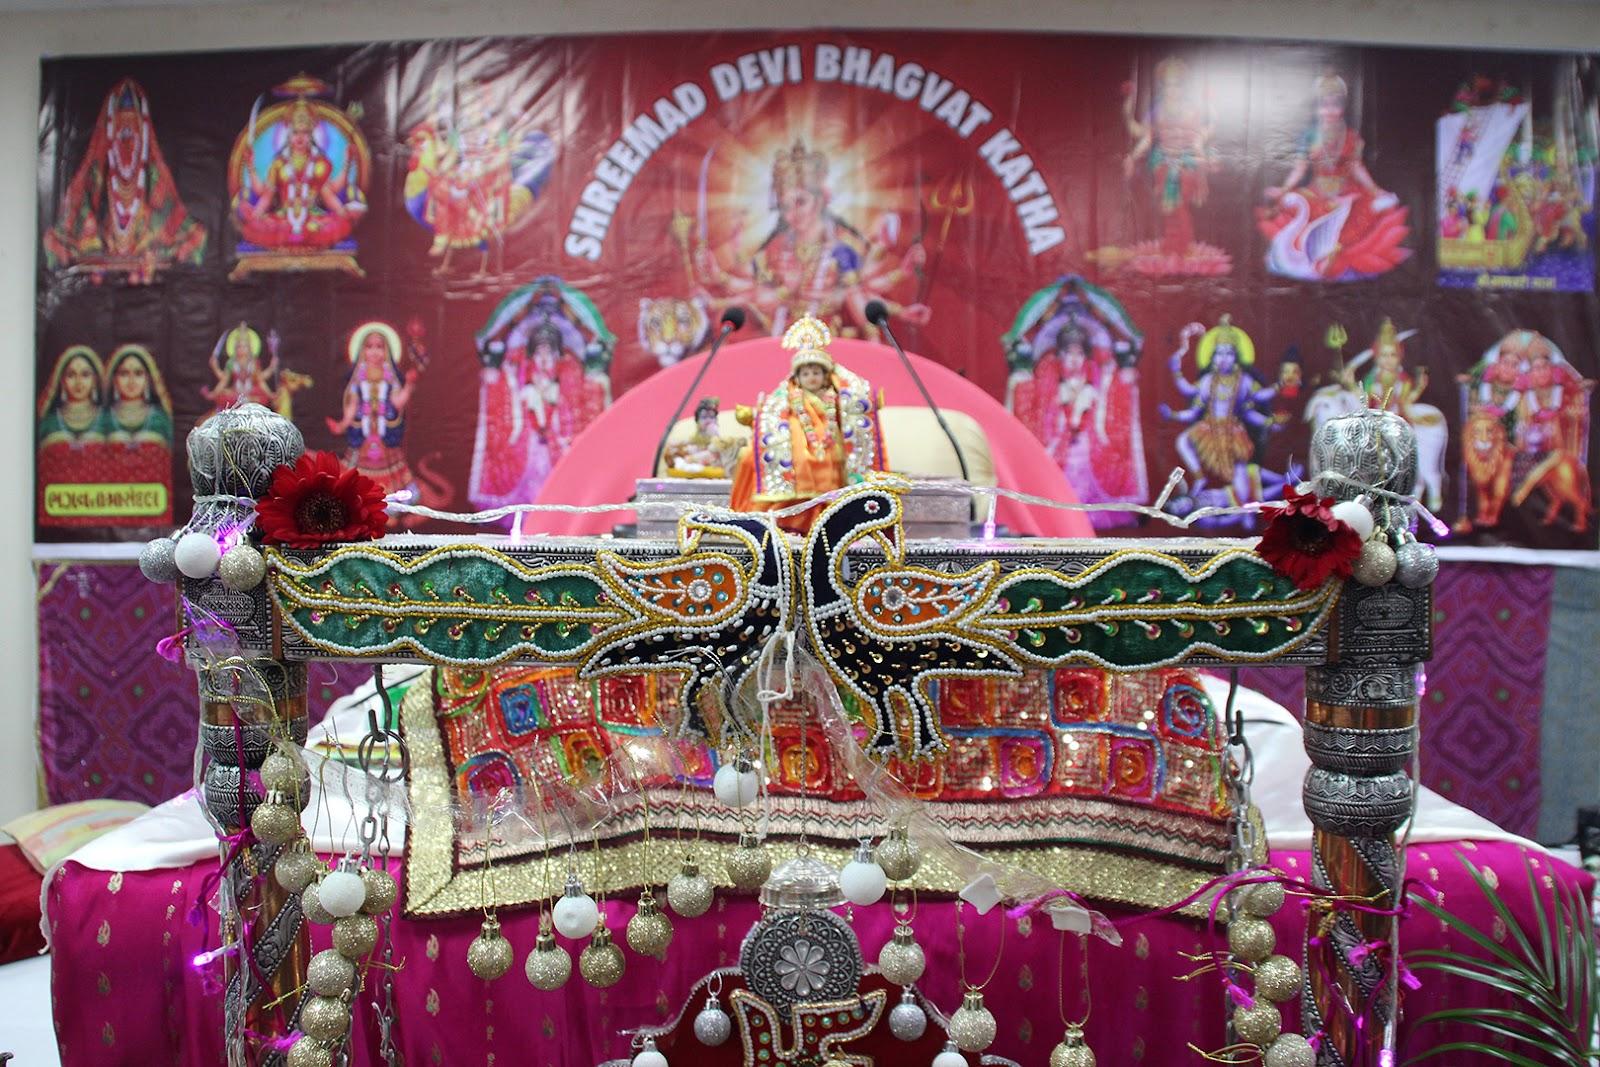 Shreemad Devi Bhagvat Katha 2015